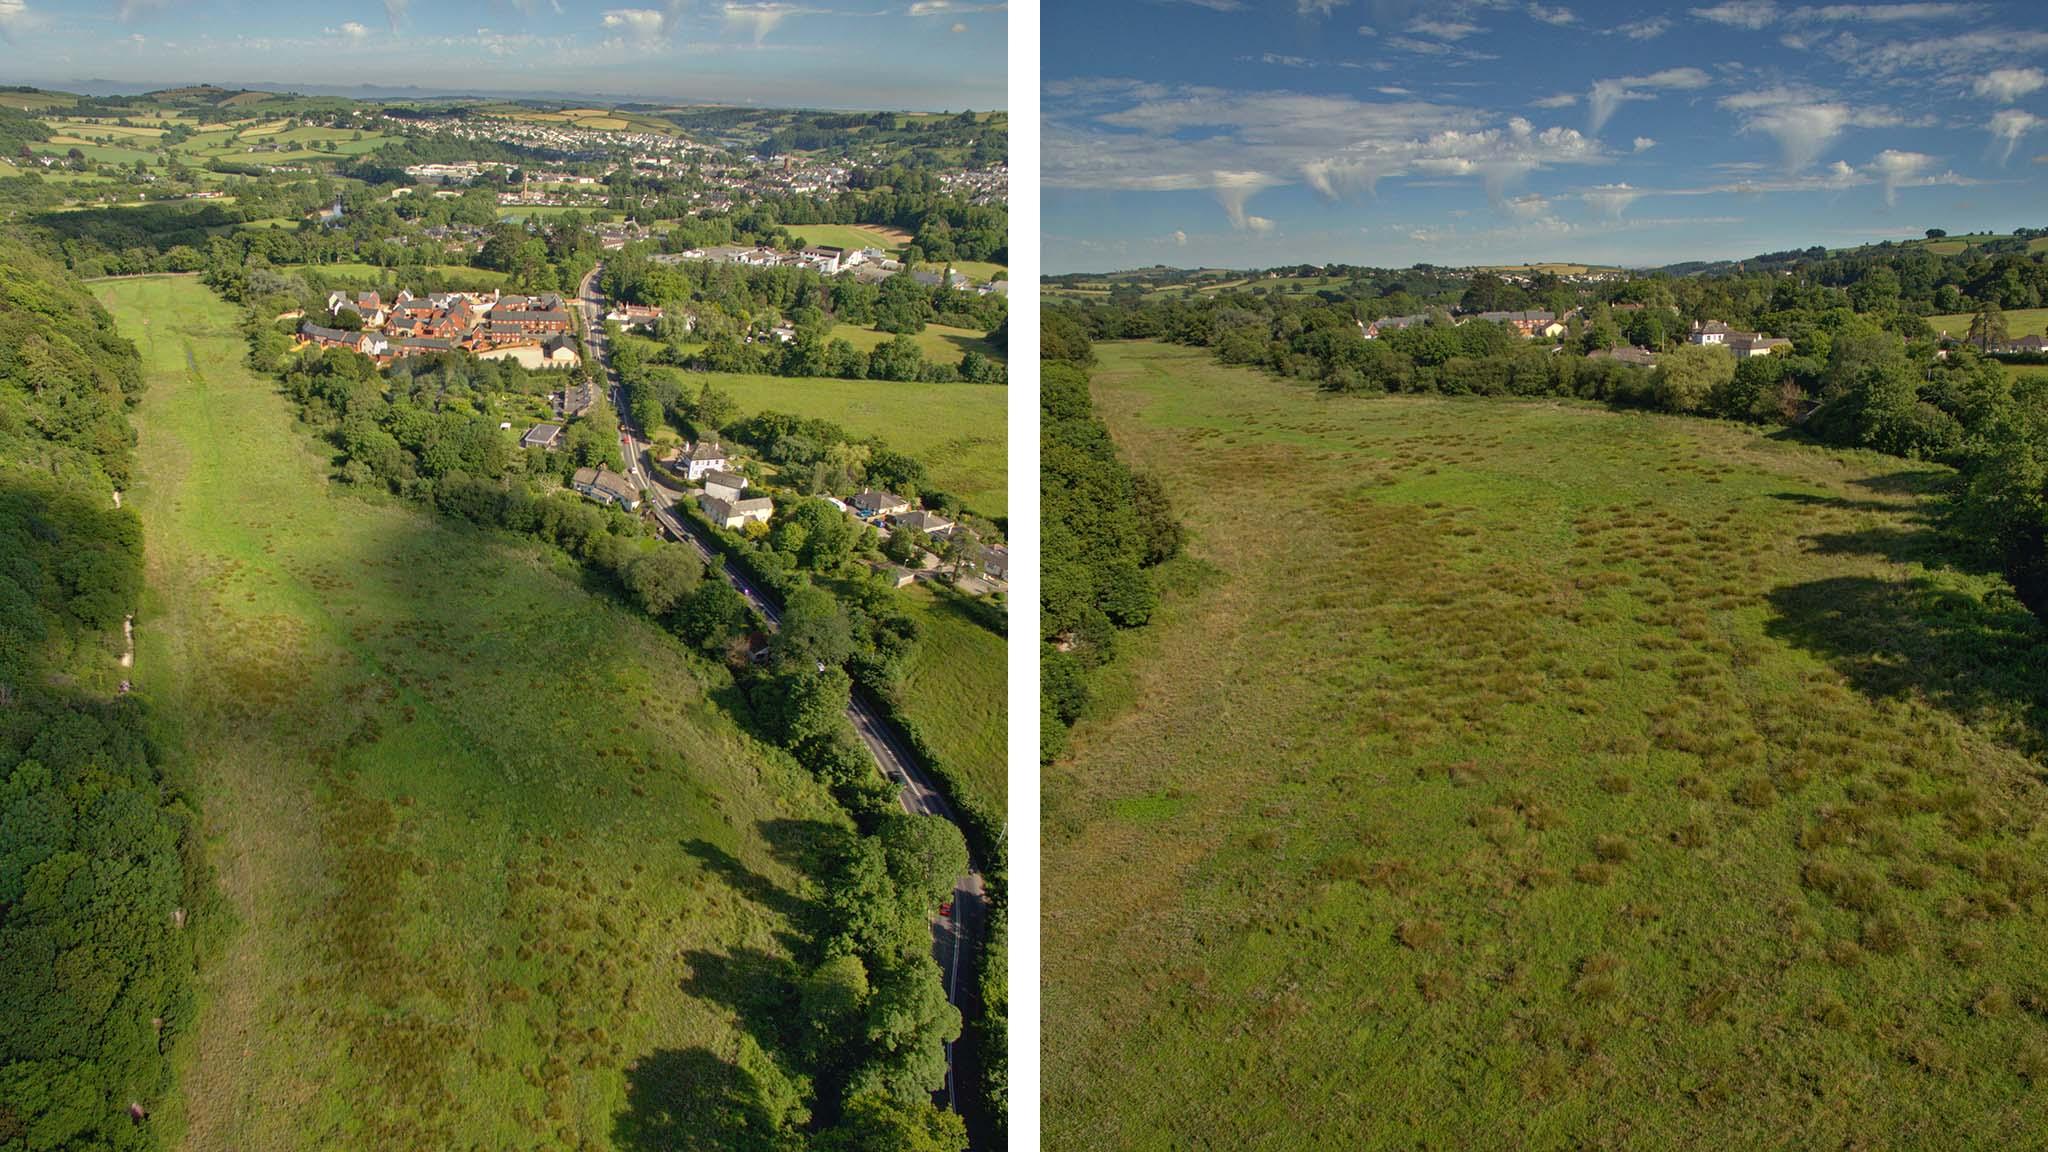 Work starts on first stage of Queen's Marsh wetland habitat restoration